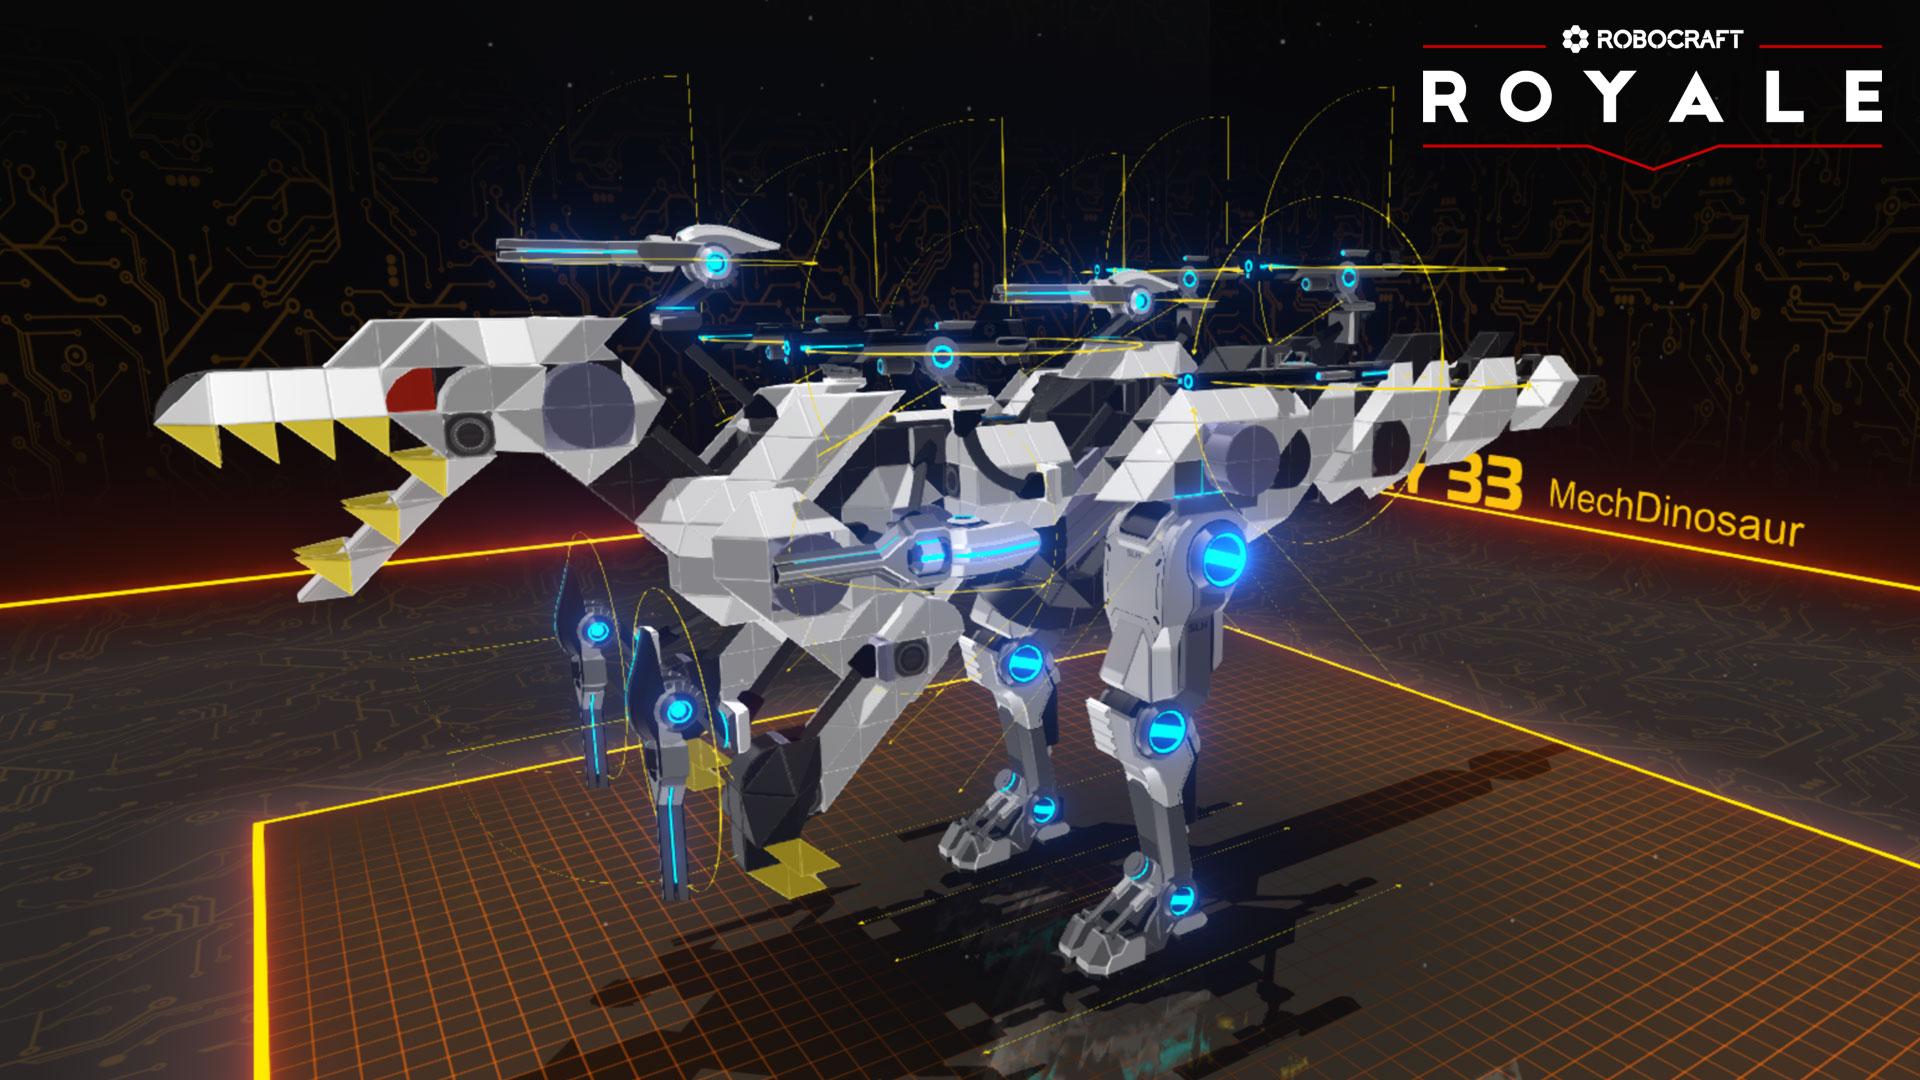 Robocraft Royale - an Experiment by Freejam news - Mod DB